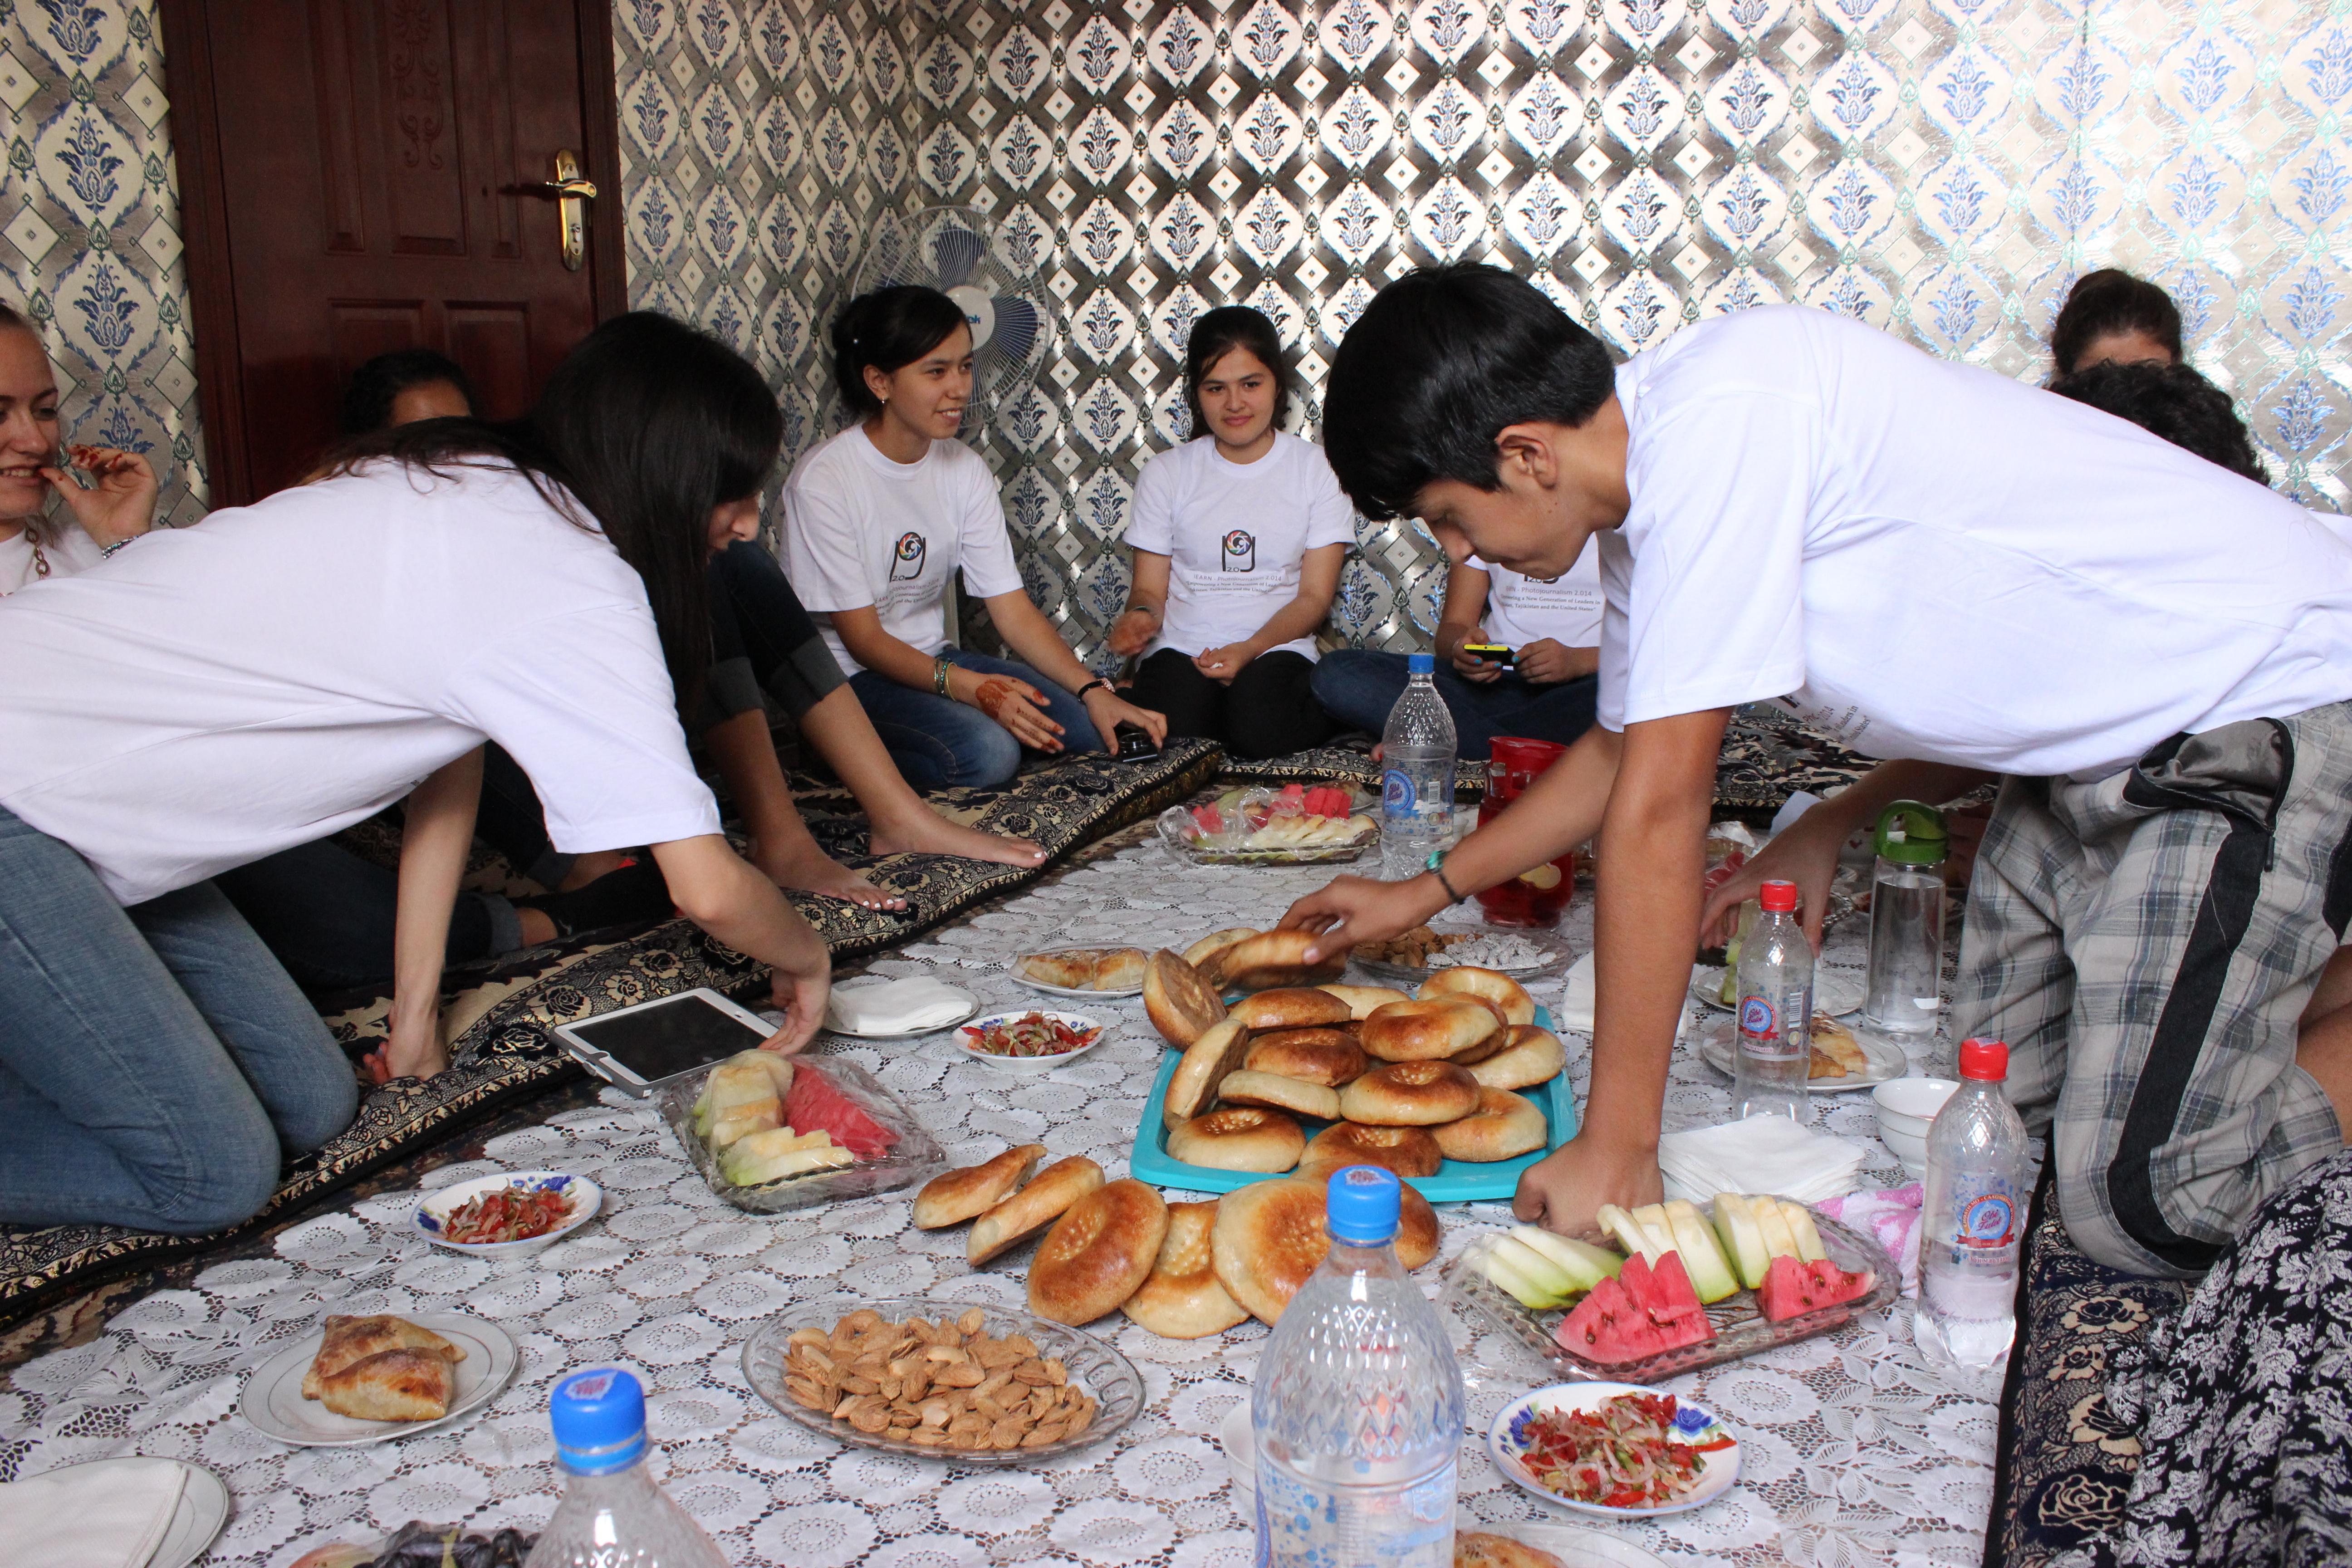 Photjournalism 2 014 Tajikistan Tradition Tajik Meal